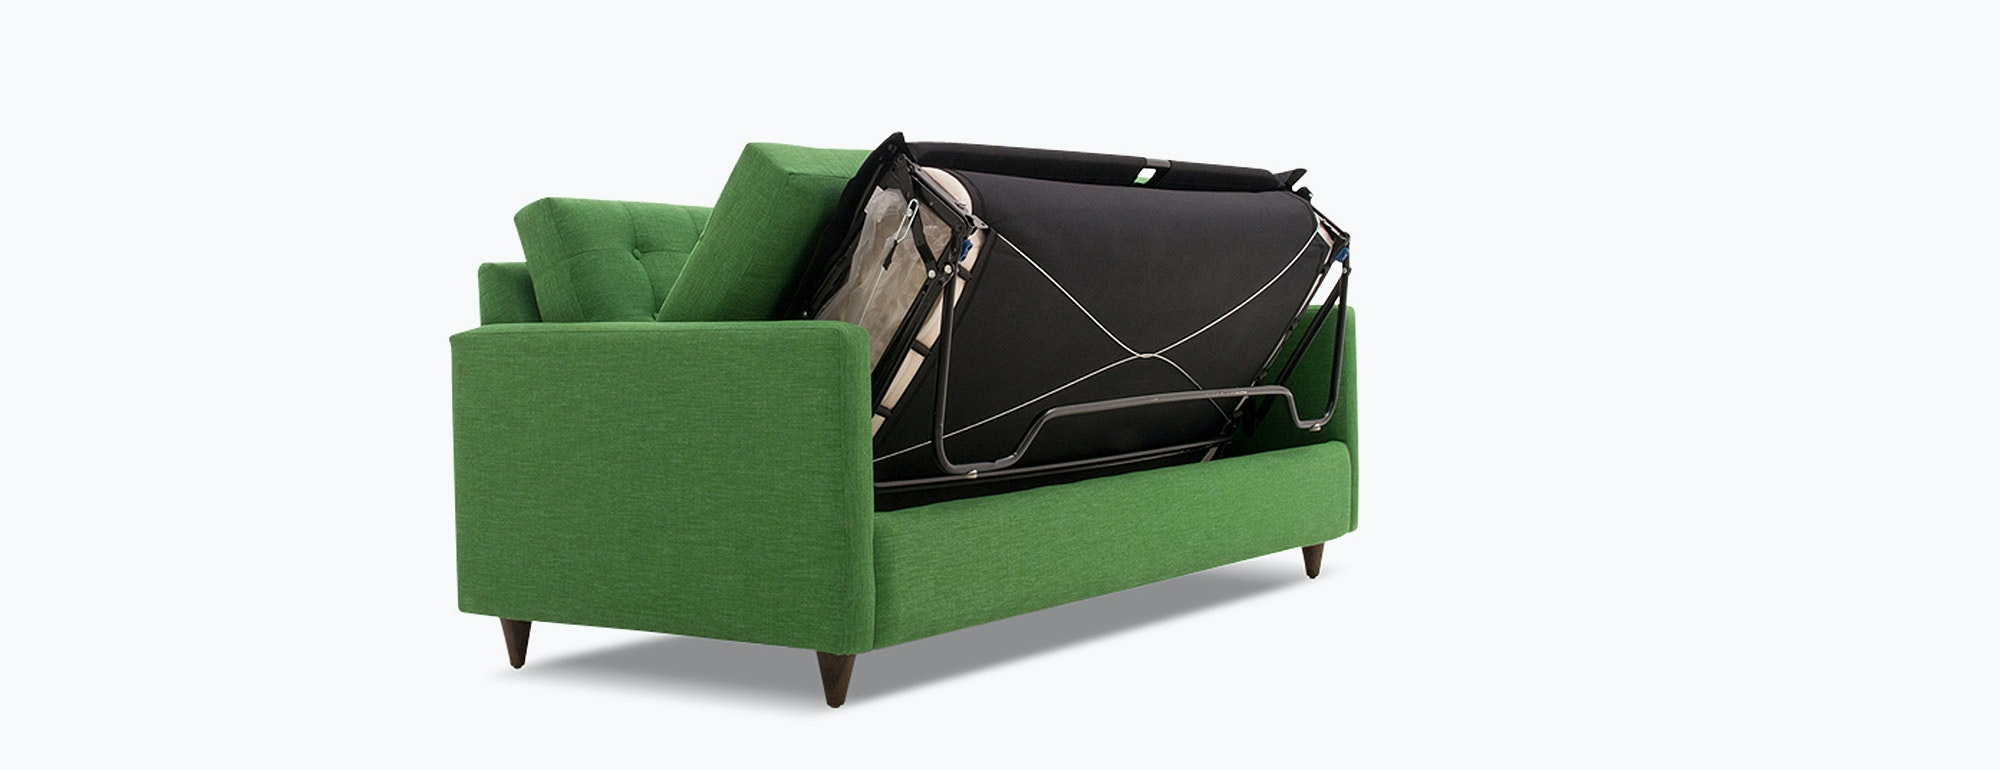 - √ Green Sleeper Sofa Green Sectional Sofa Lazy Boy